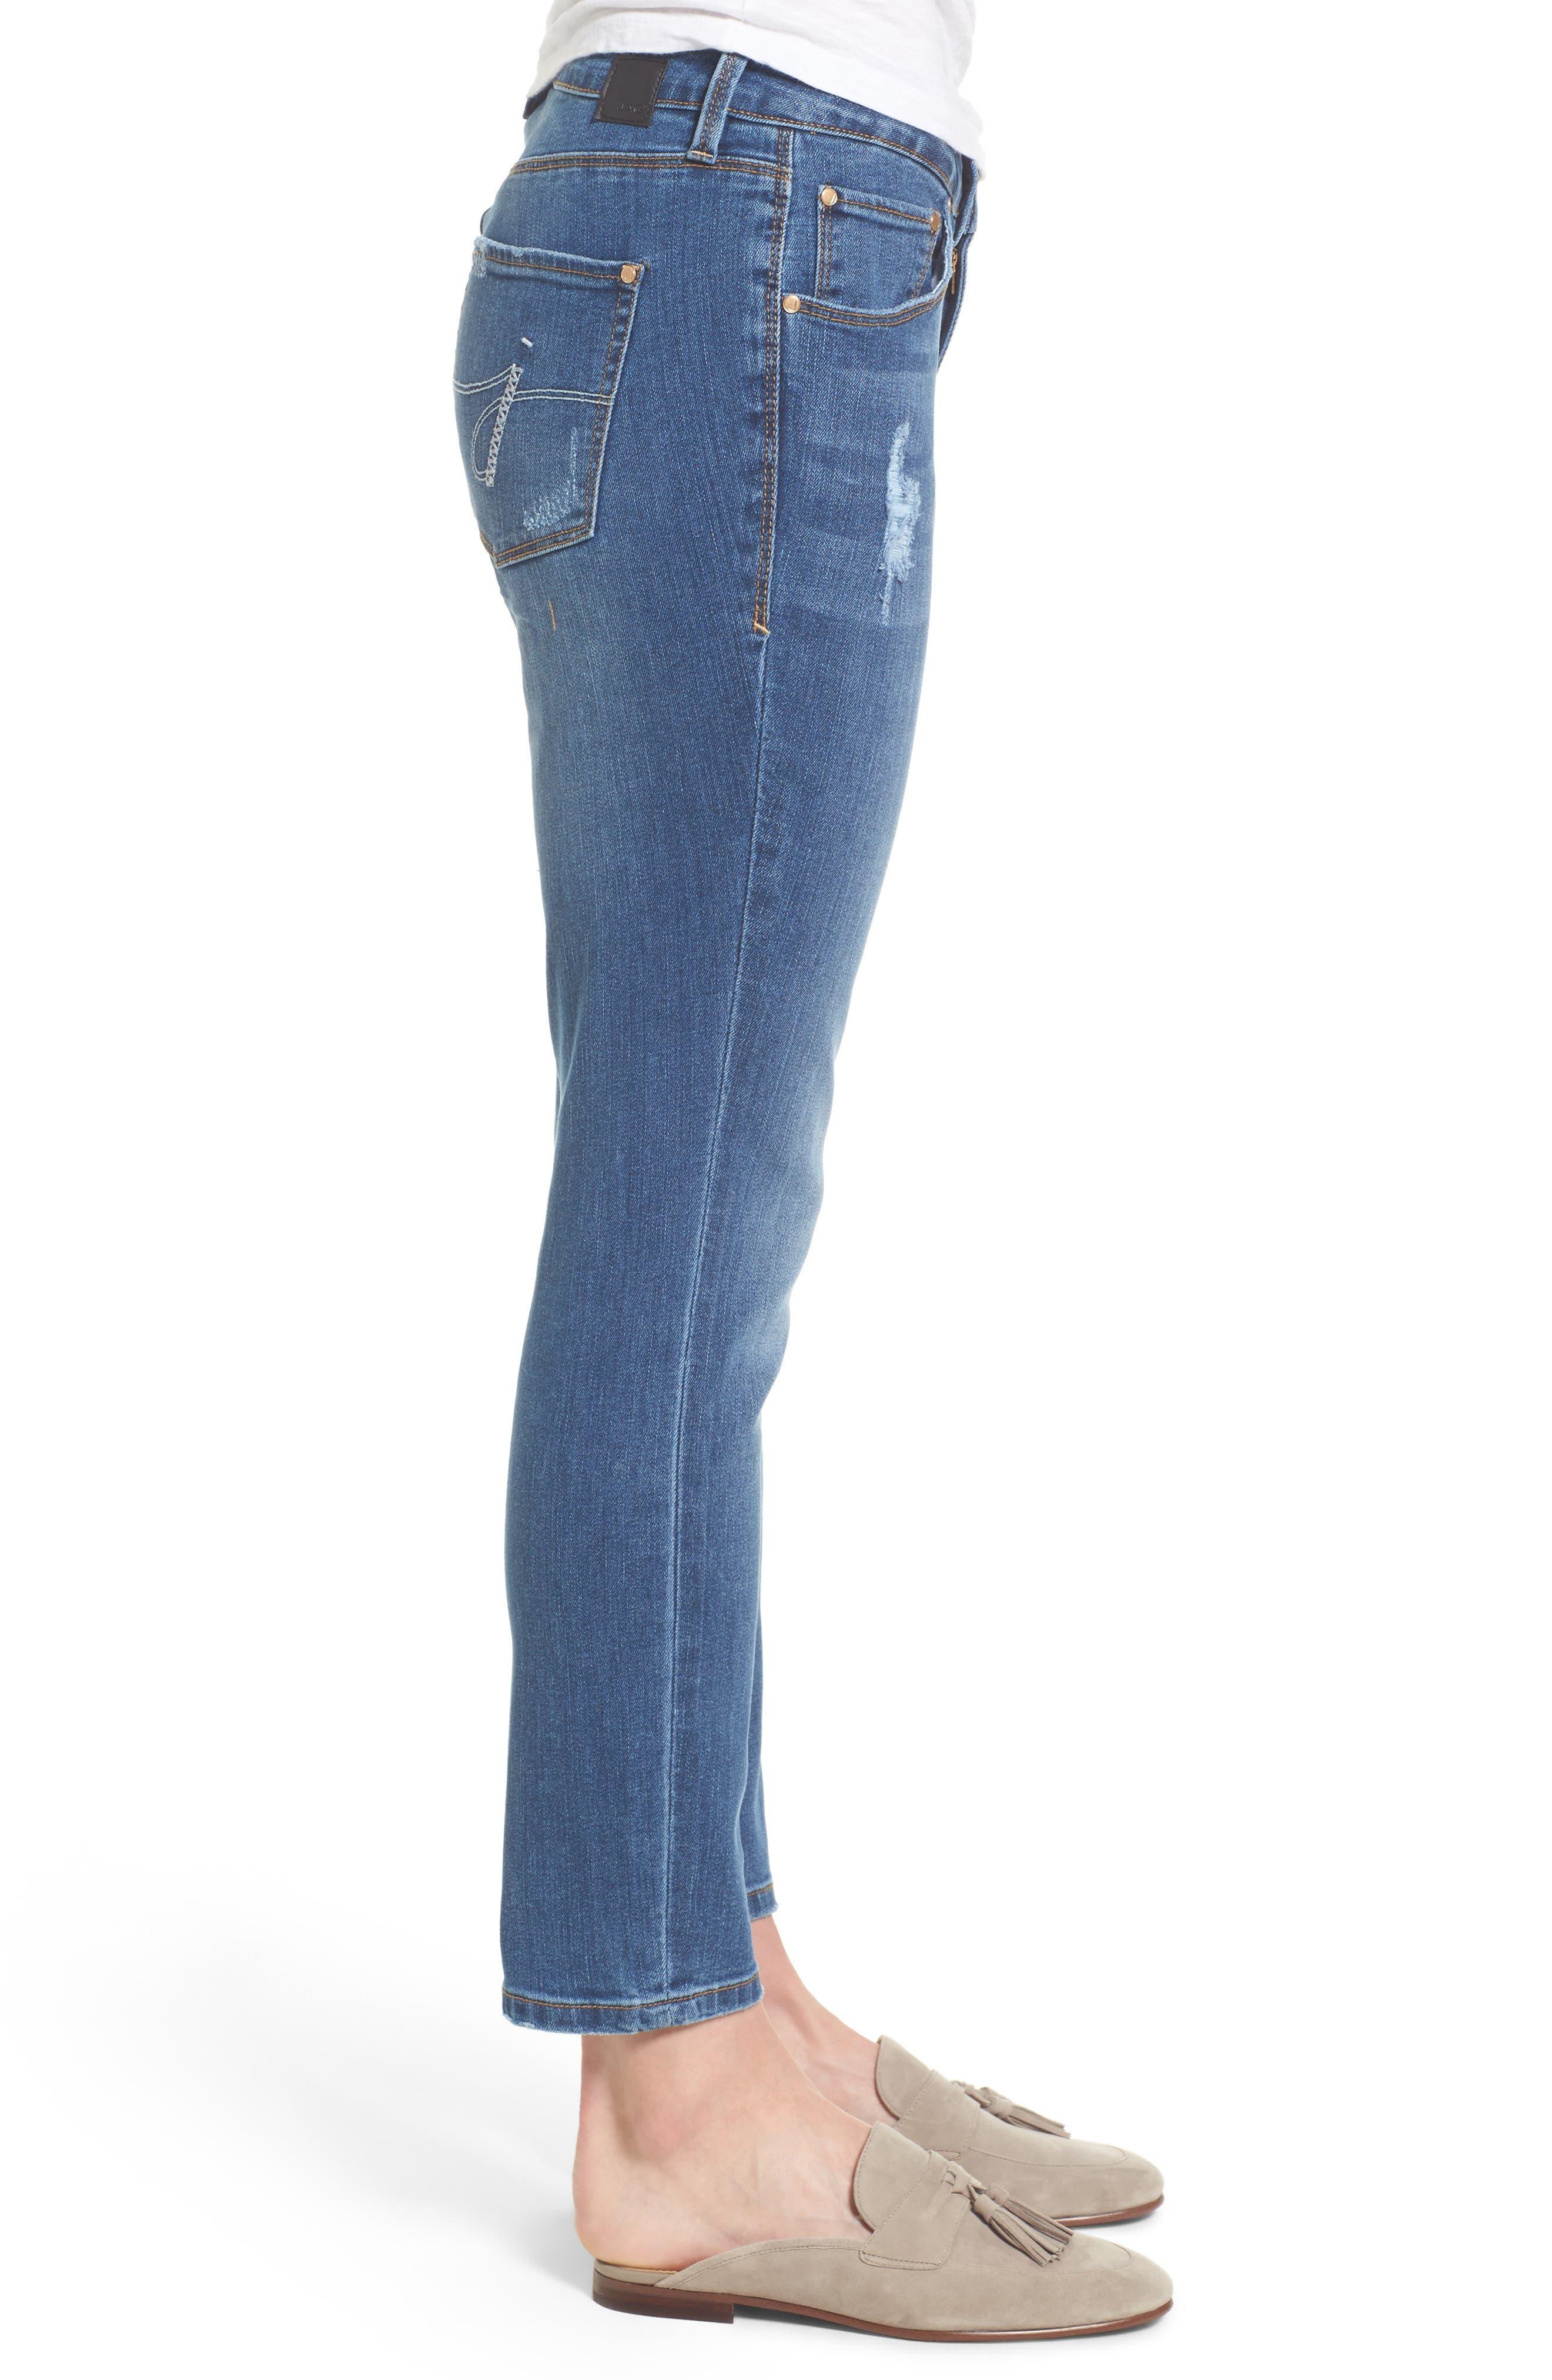 Mera Skinny Ankle Jeans,                             Alternate thumbnail 3, color,                             420